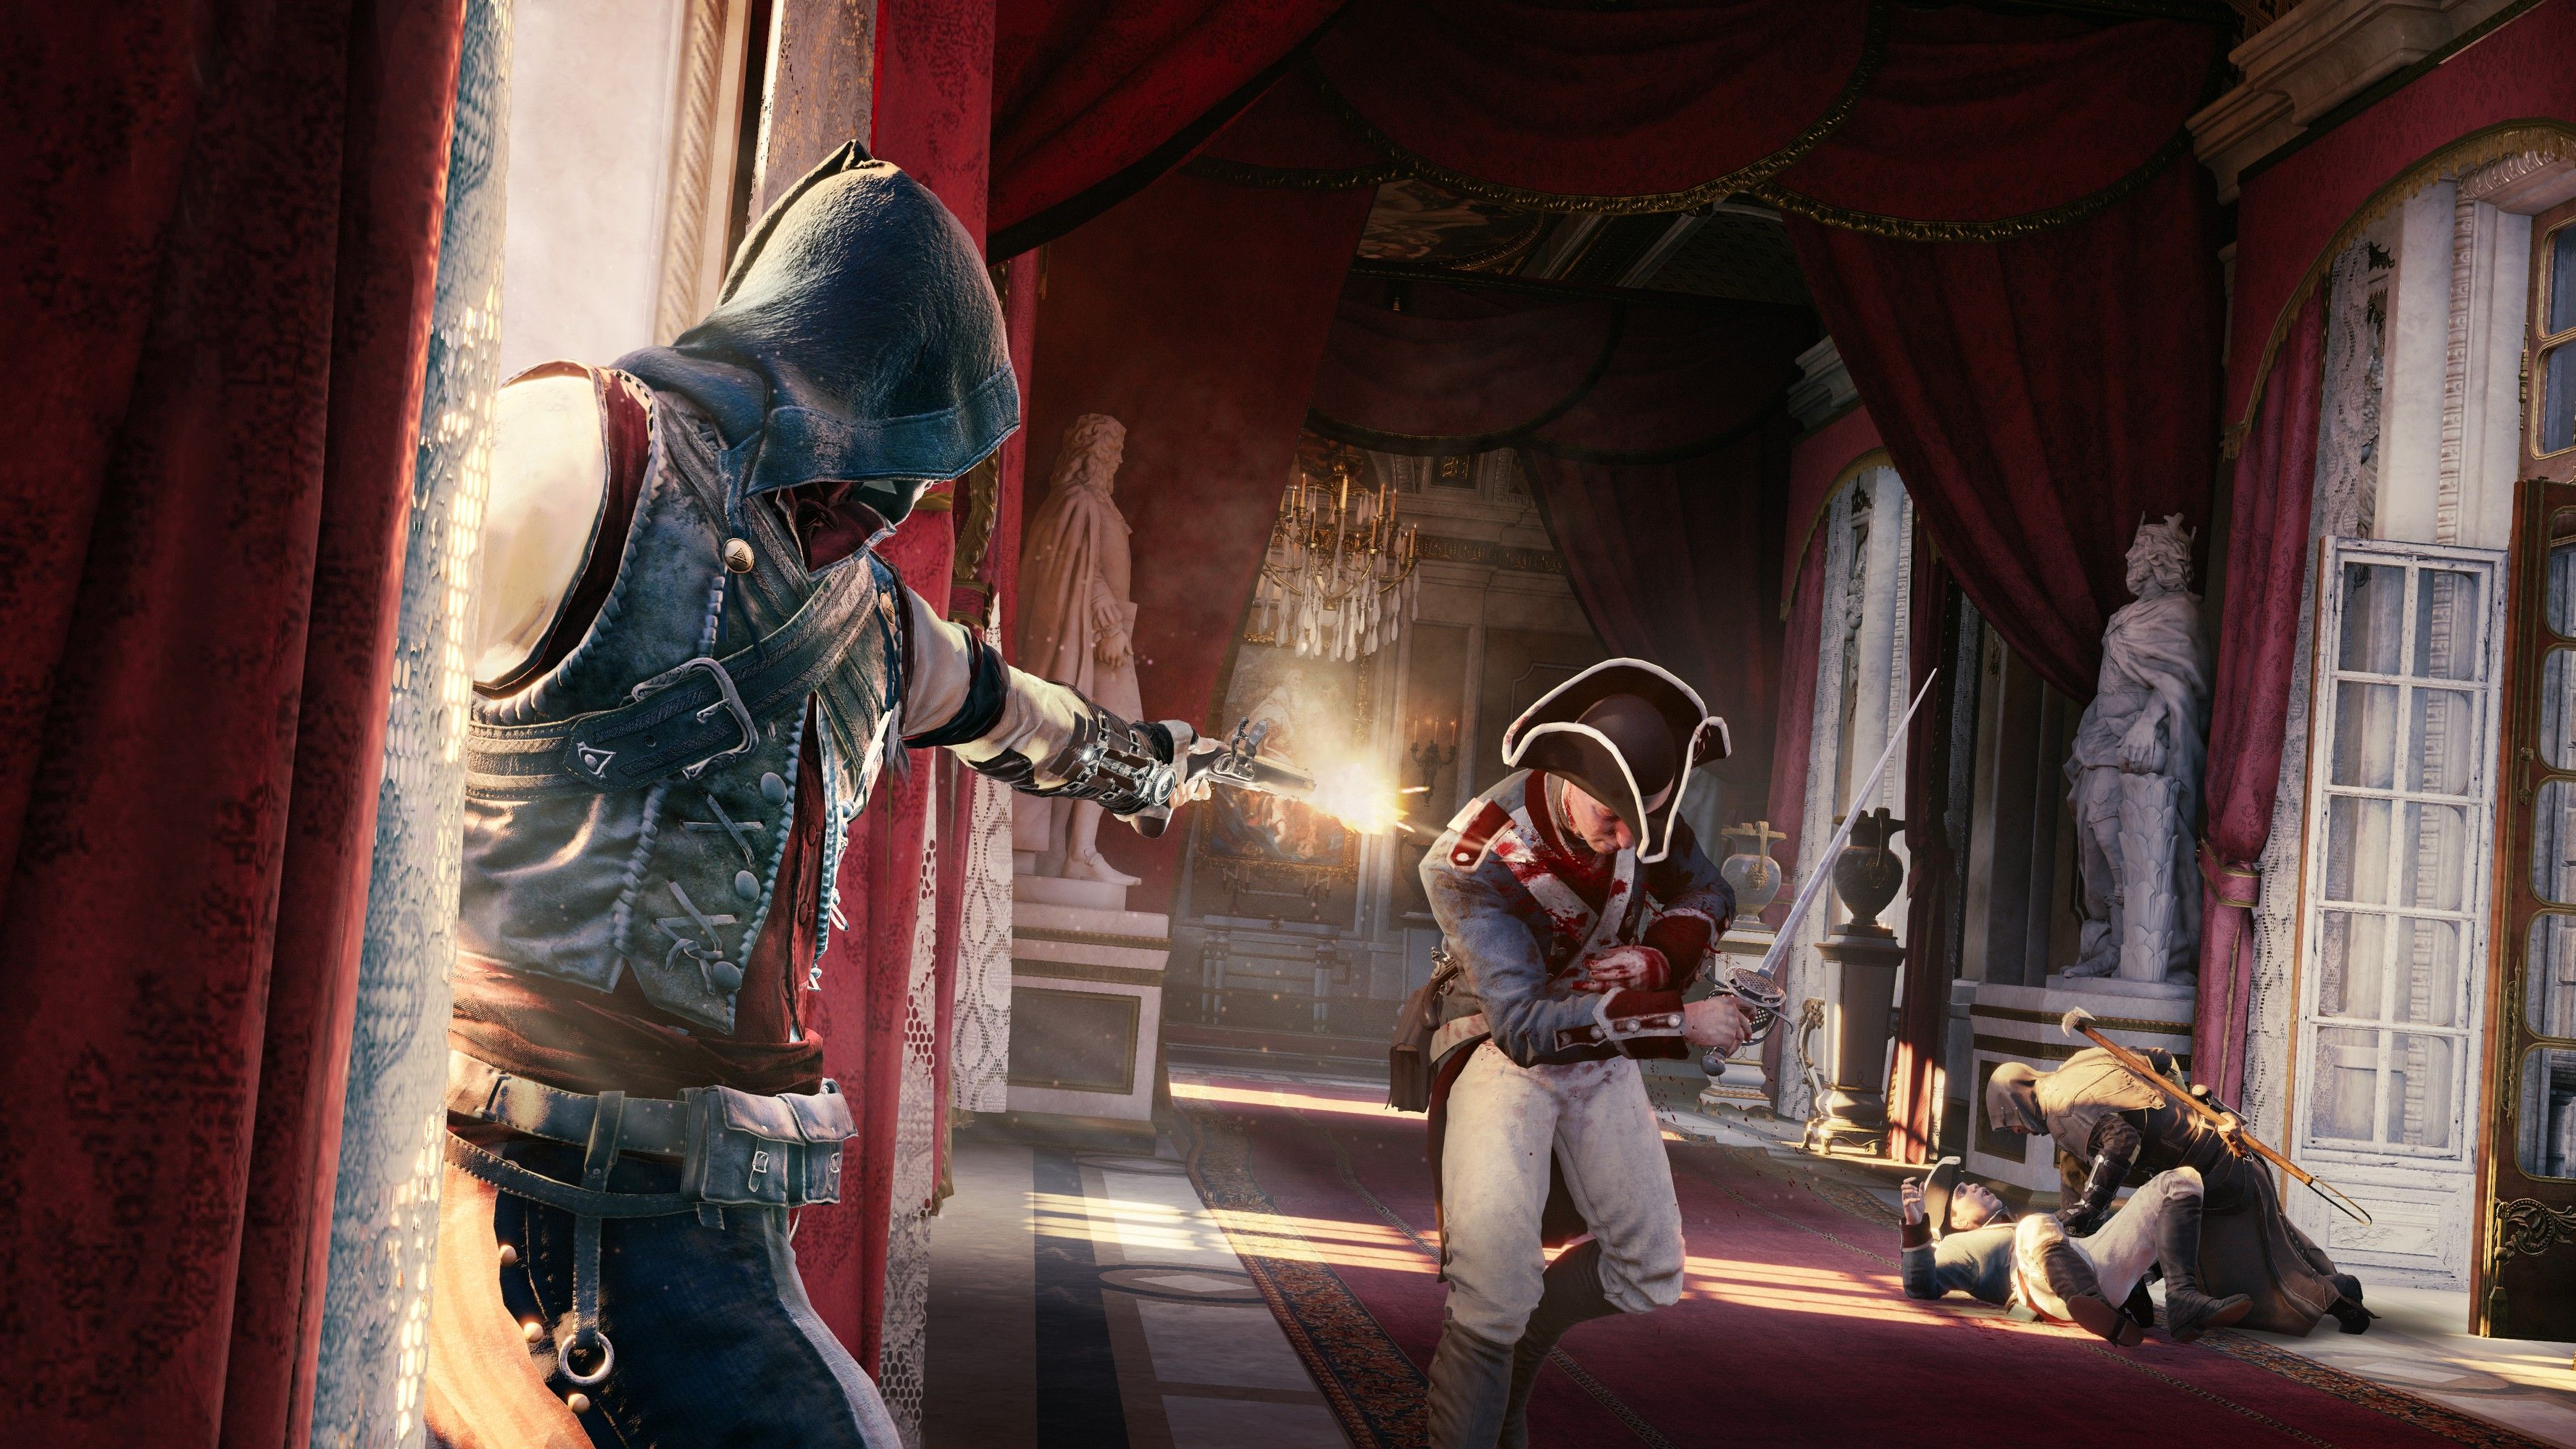 Assassin's Creed Unity (PC) - 6